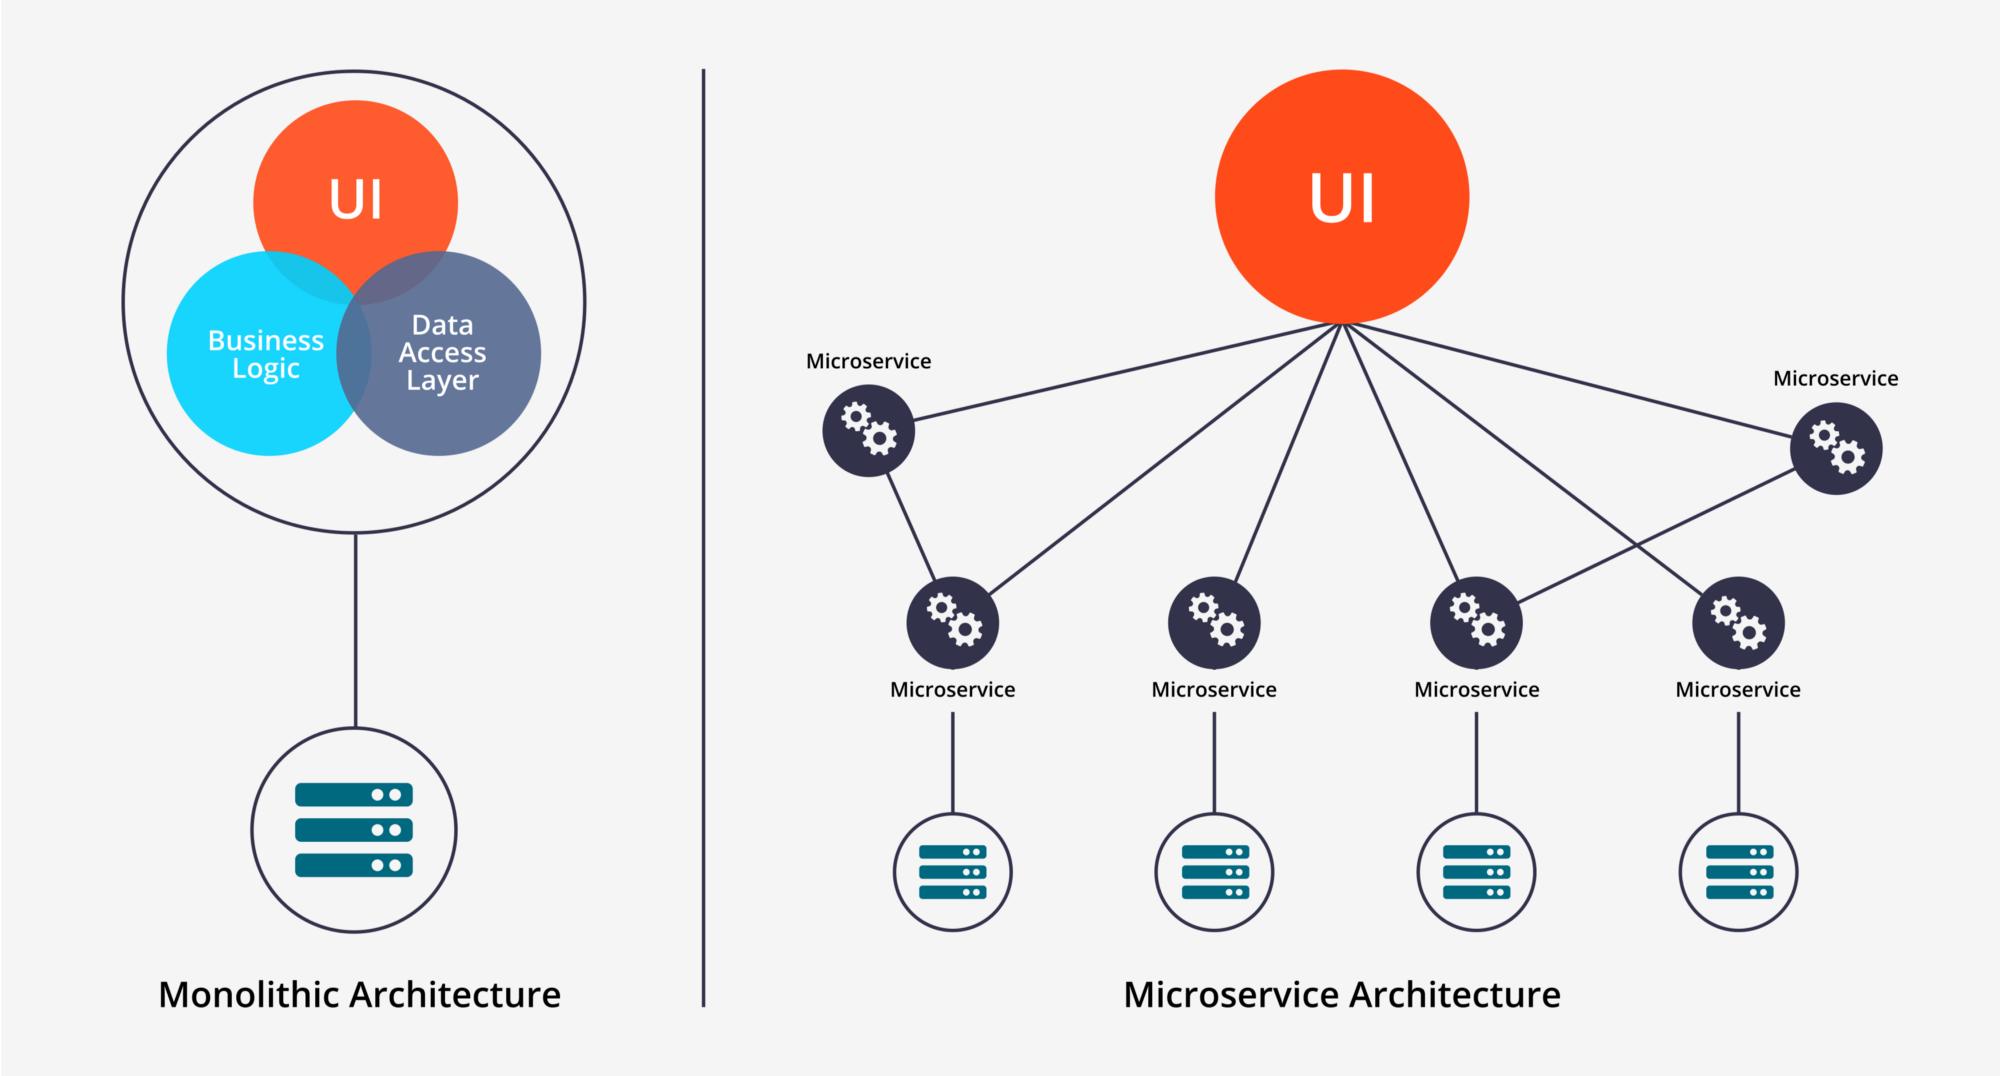 Microservices Vs Monolithic Architecture Software Architecture Design Technical Architecture Infographic Software